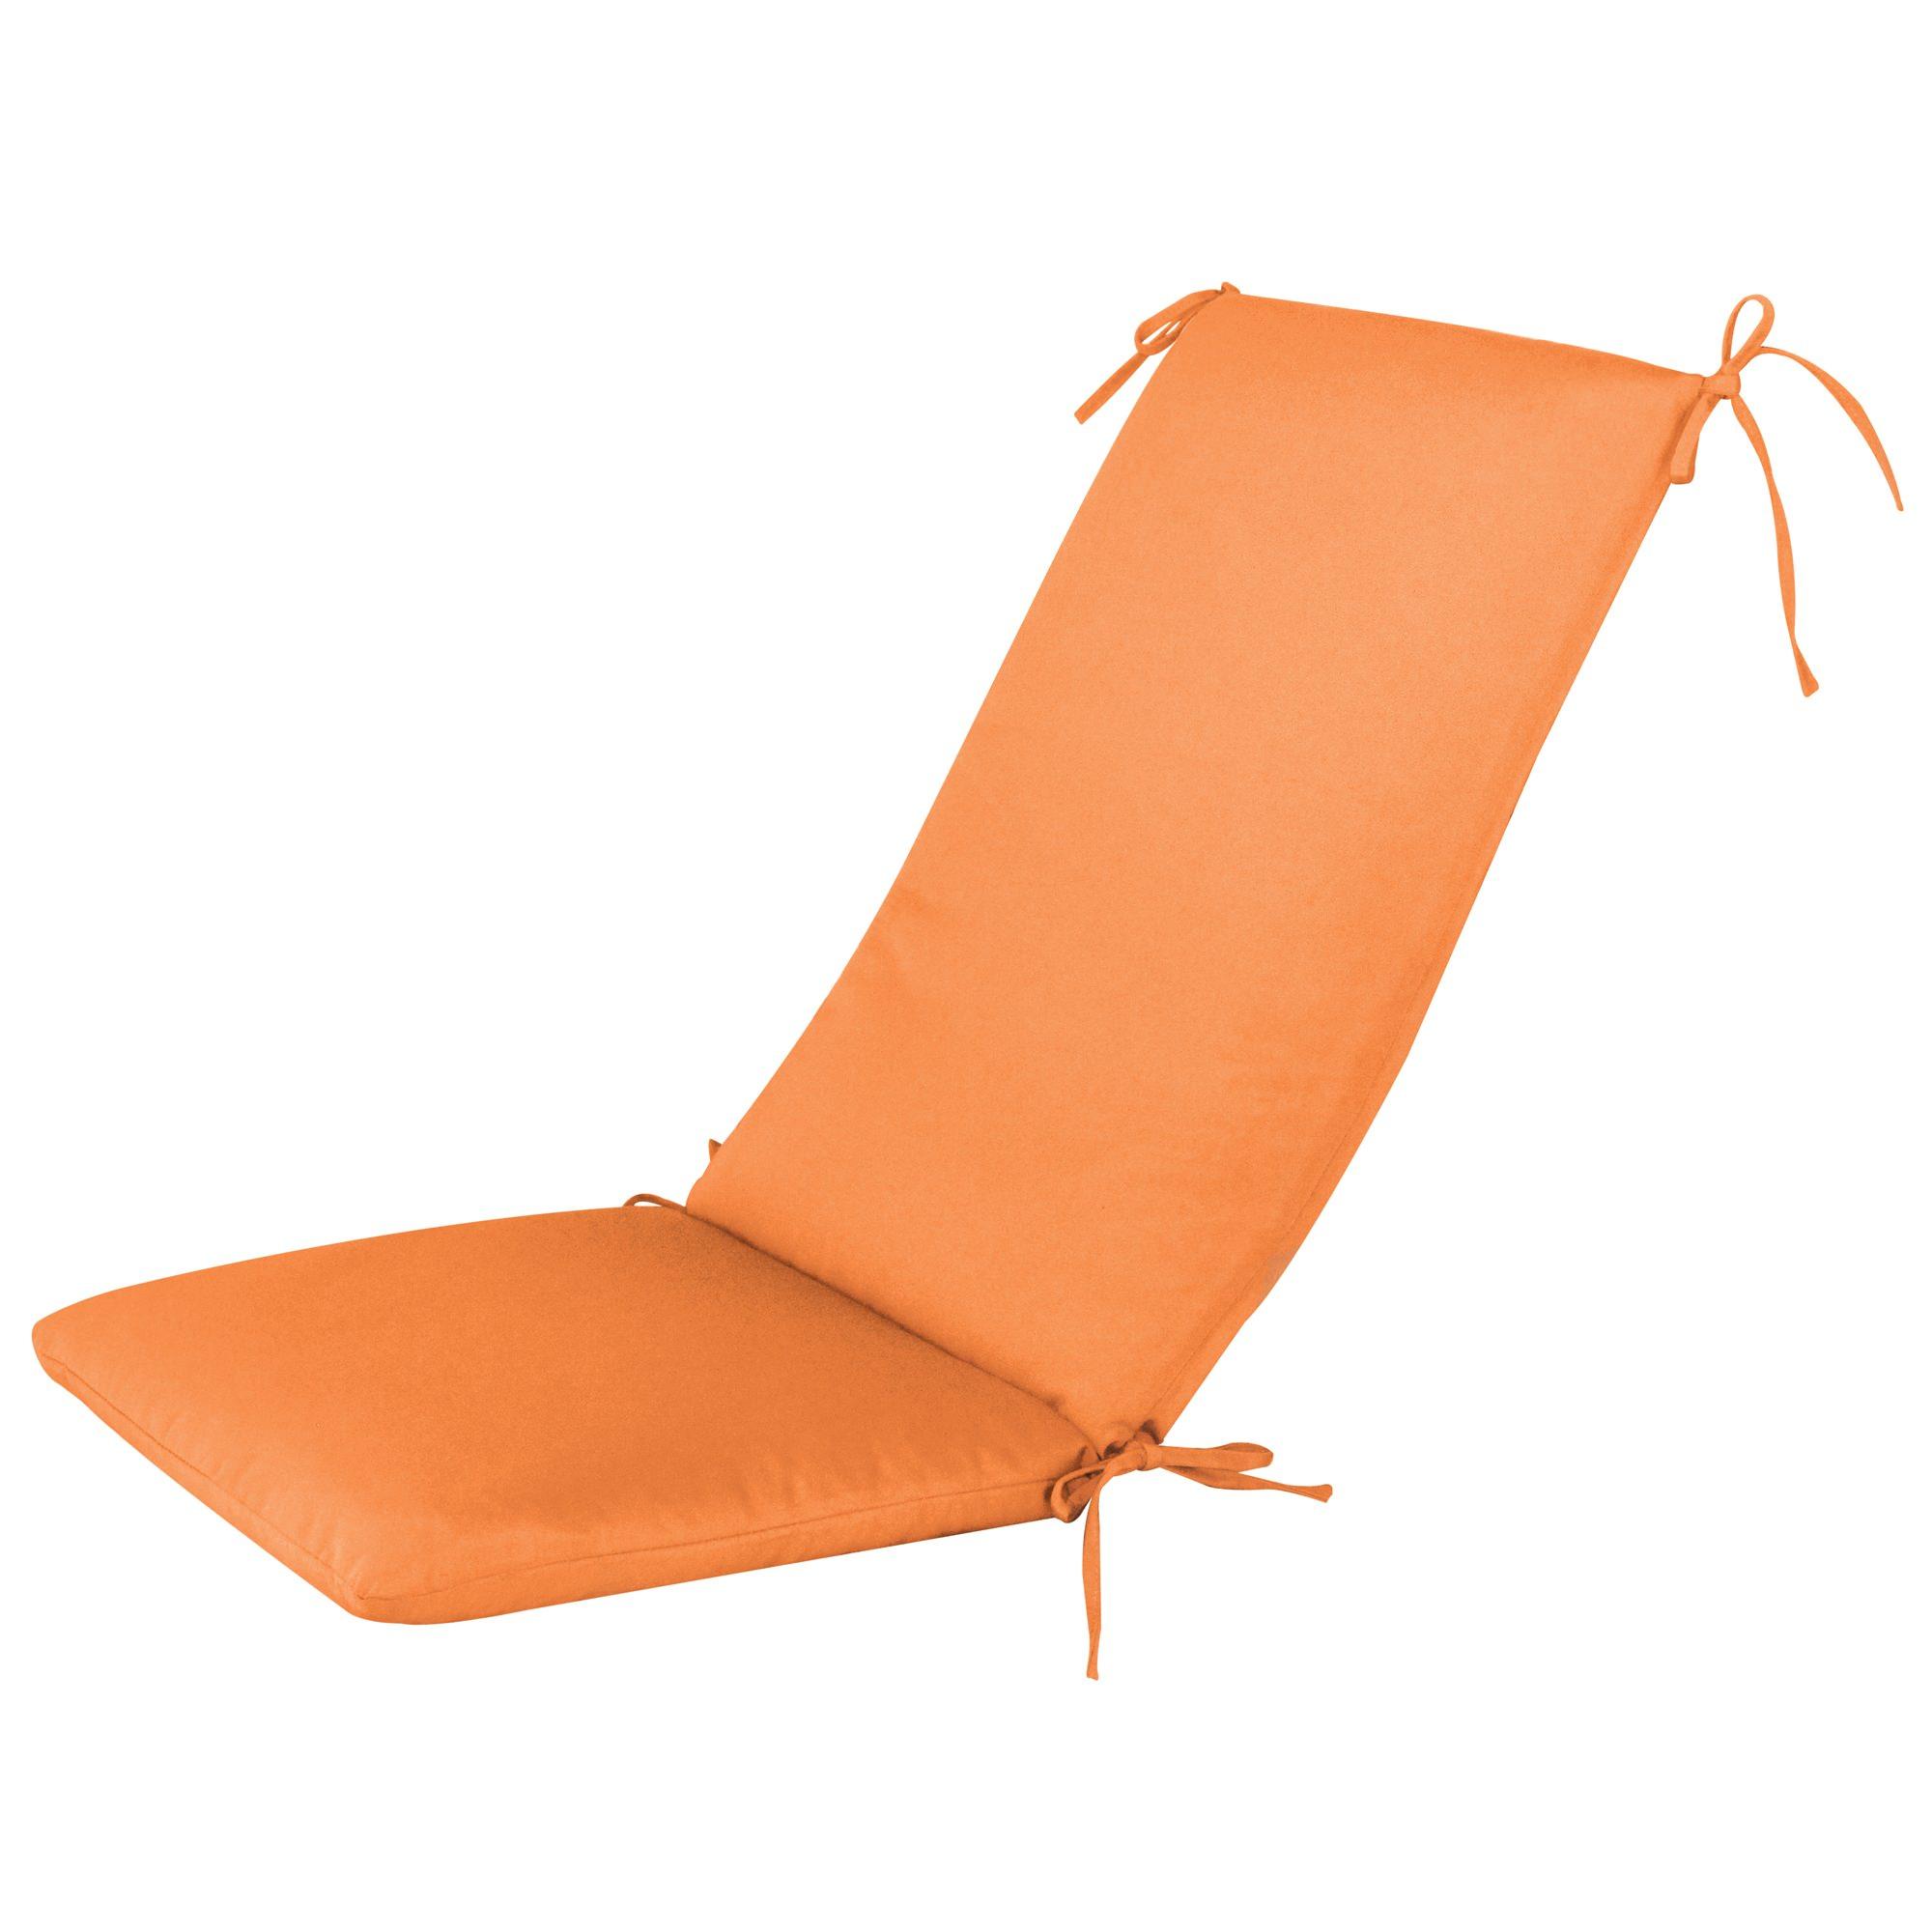 Outdoor high back chair cushions - Knife Edge Sunbrella High Back Chair Cushion